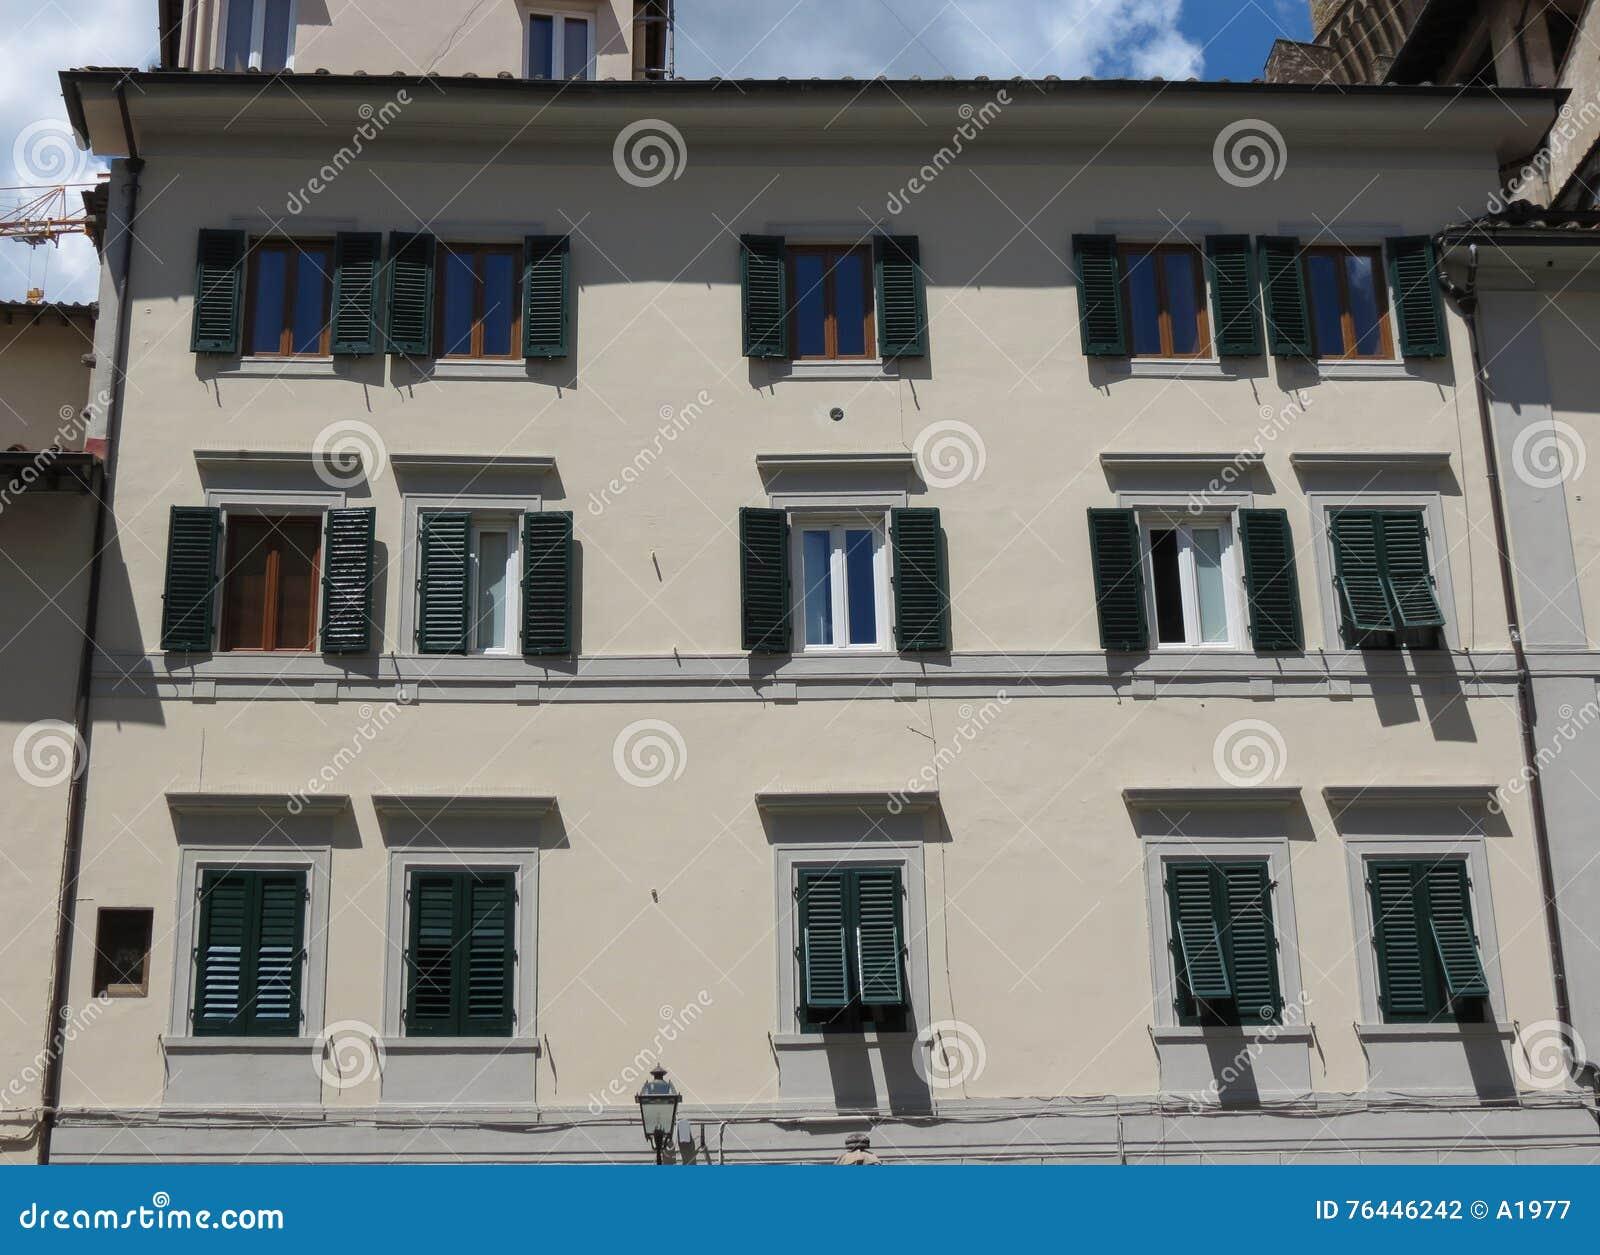 Maison traditionnelle en italie florence photo stock Maison florene